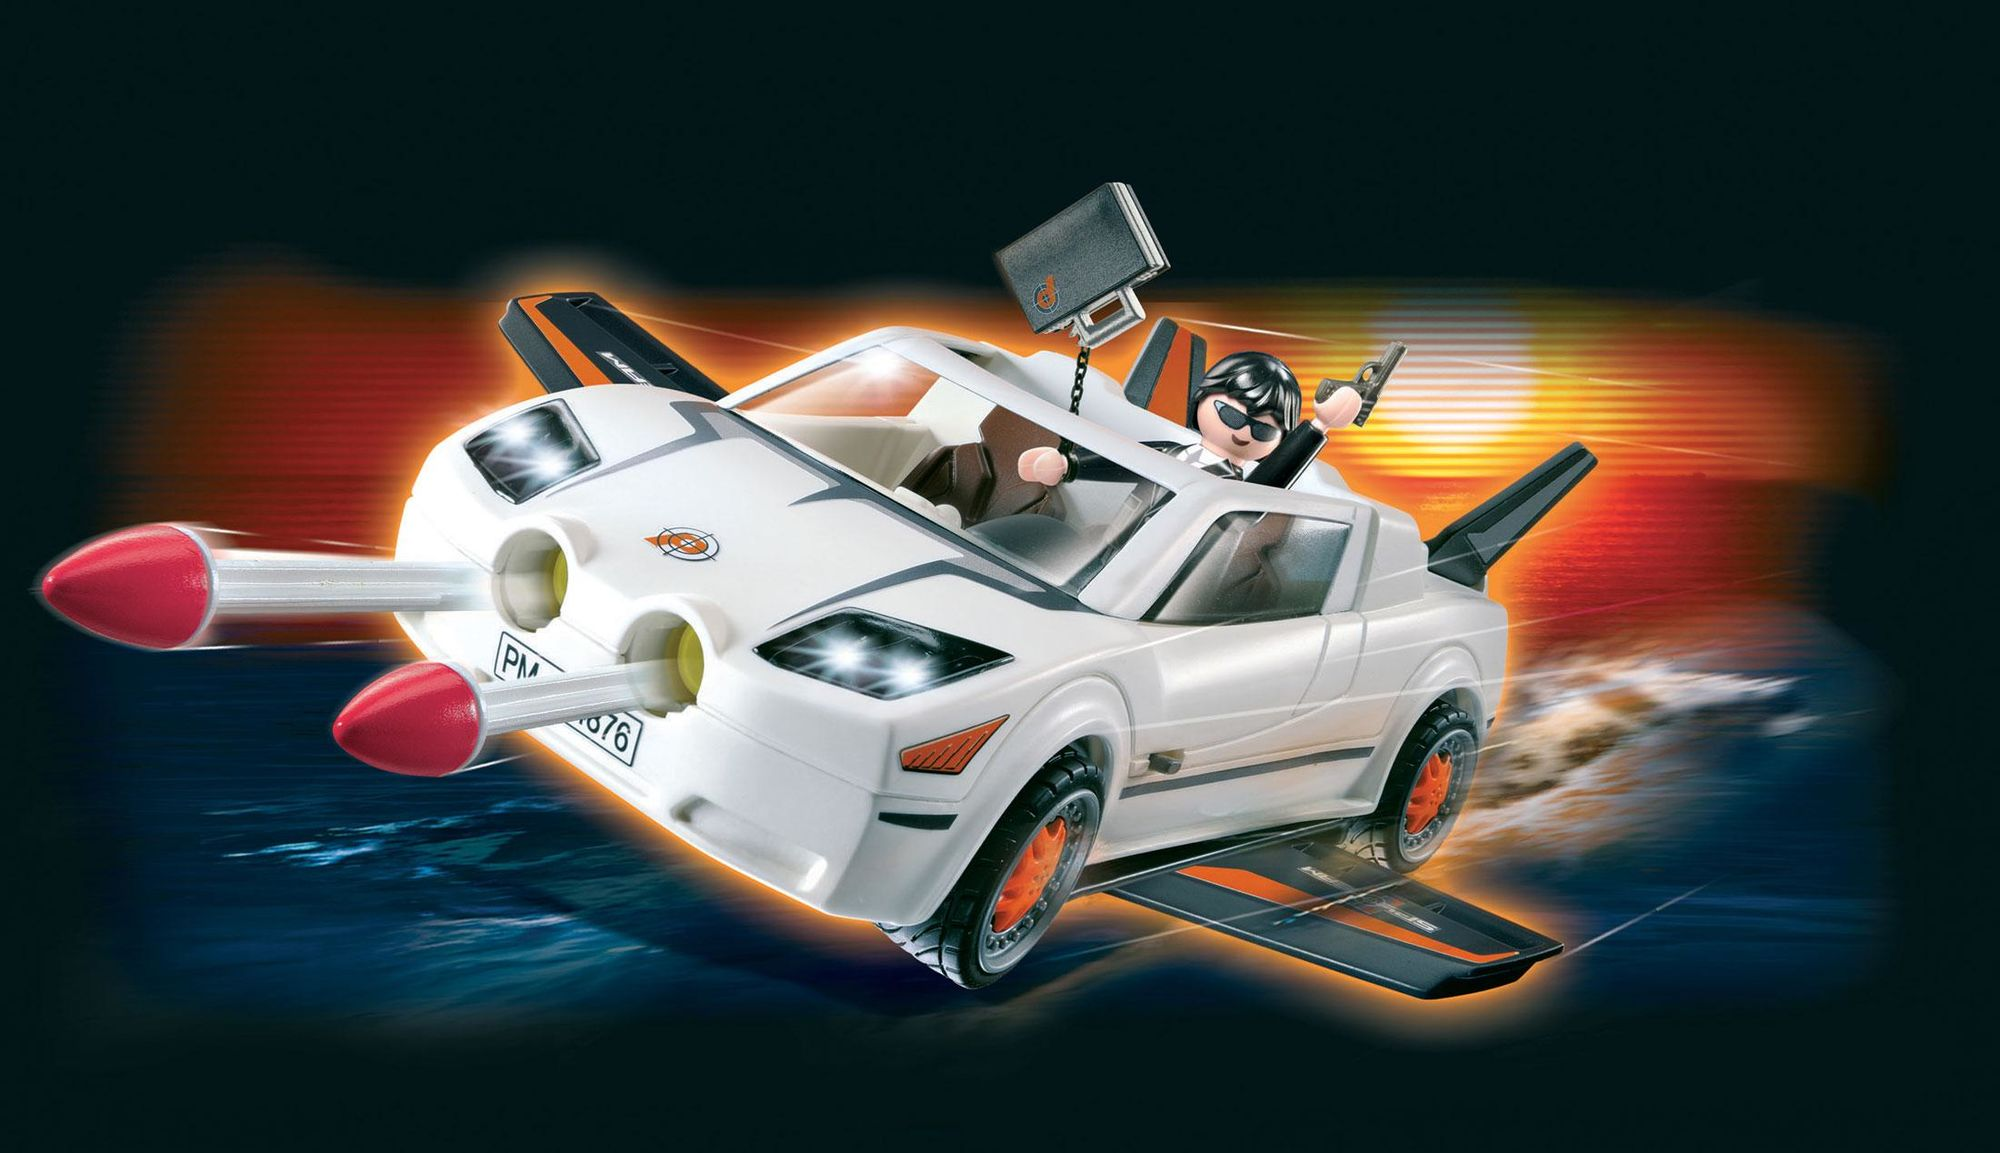 Playmobil top agents - secret agent super racer